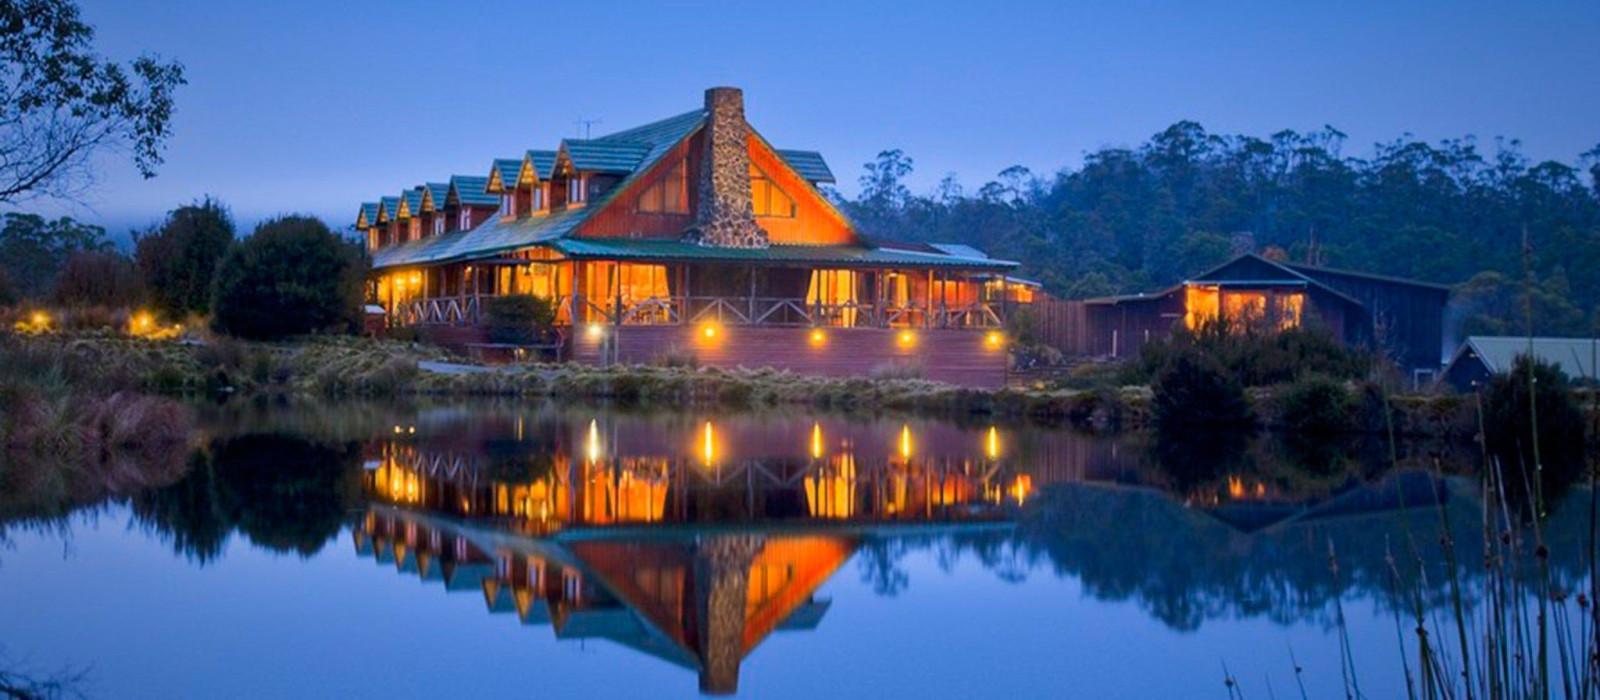 Hotel Peppers Cradle Mountain Lodge Australia